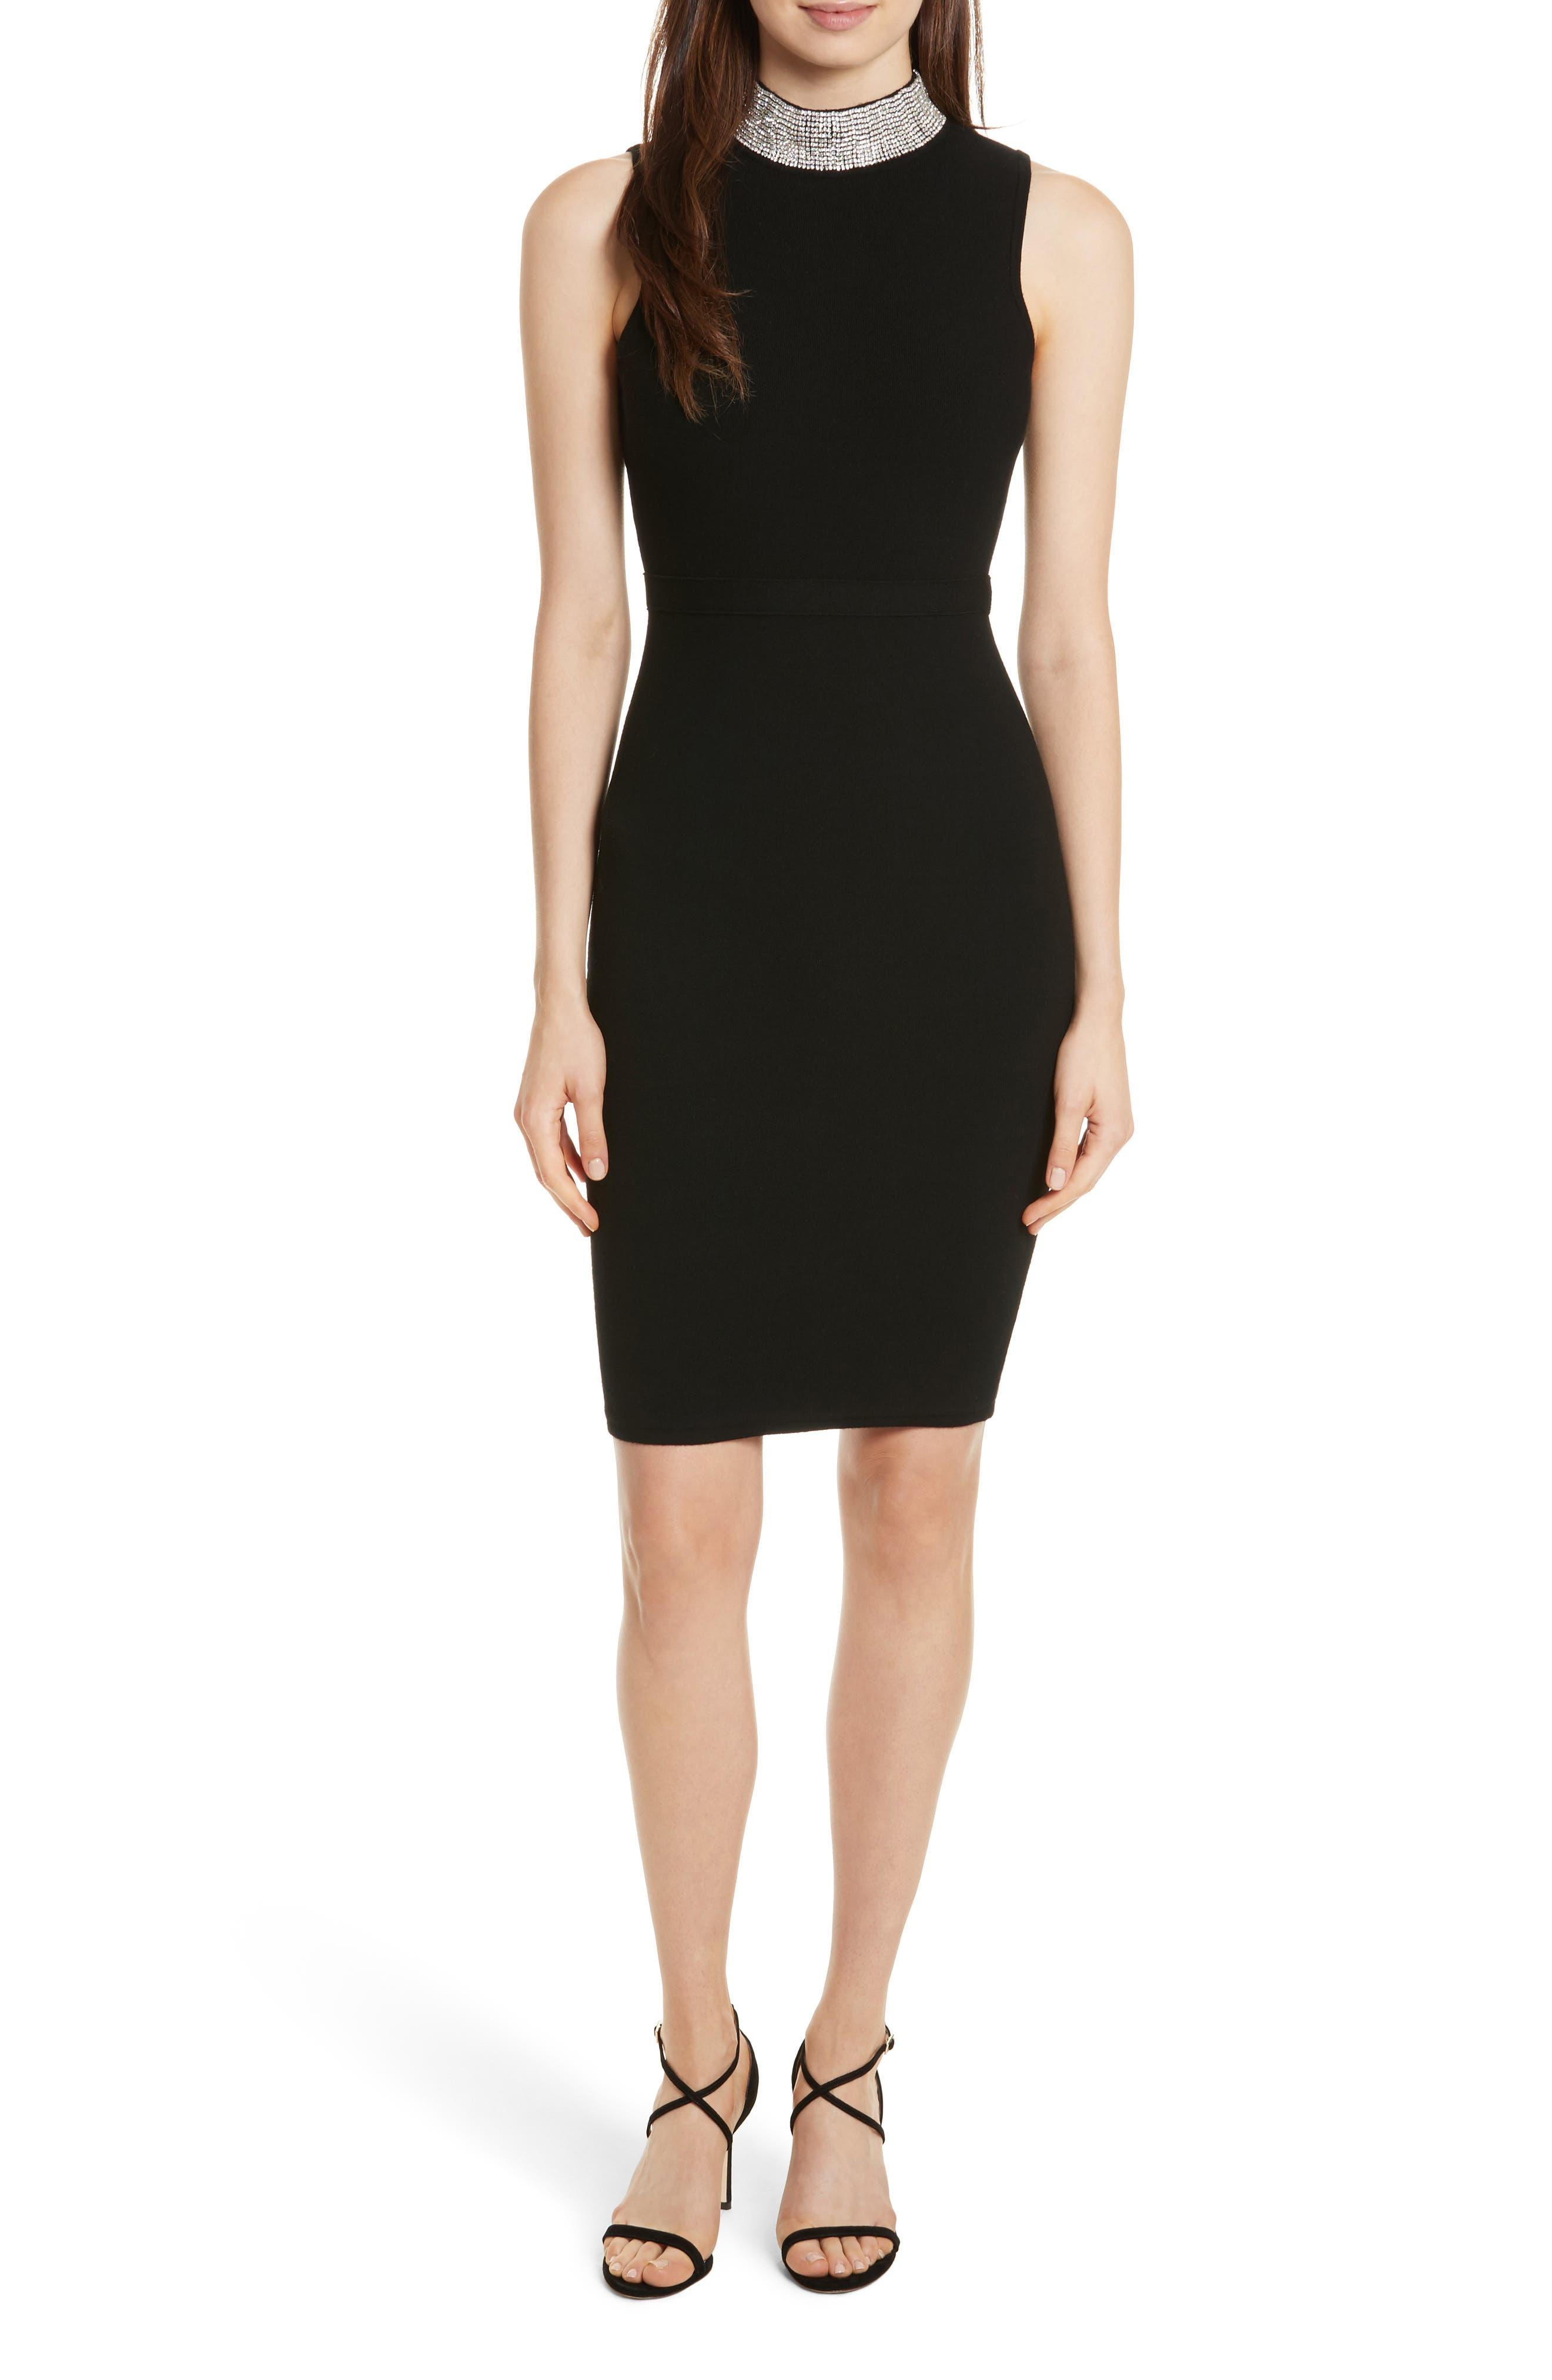 Alternate Image 1 Selected - Milly Jewel Collar Sheath Dress